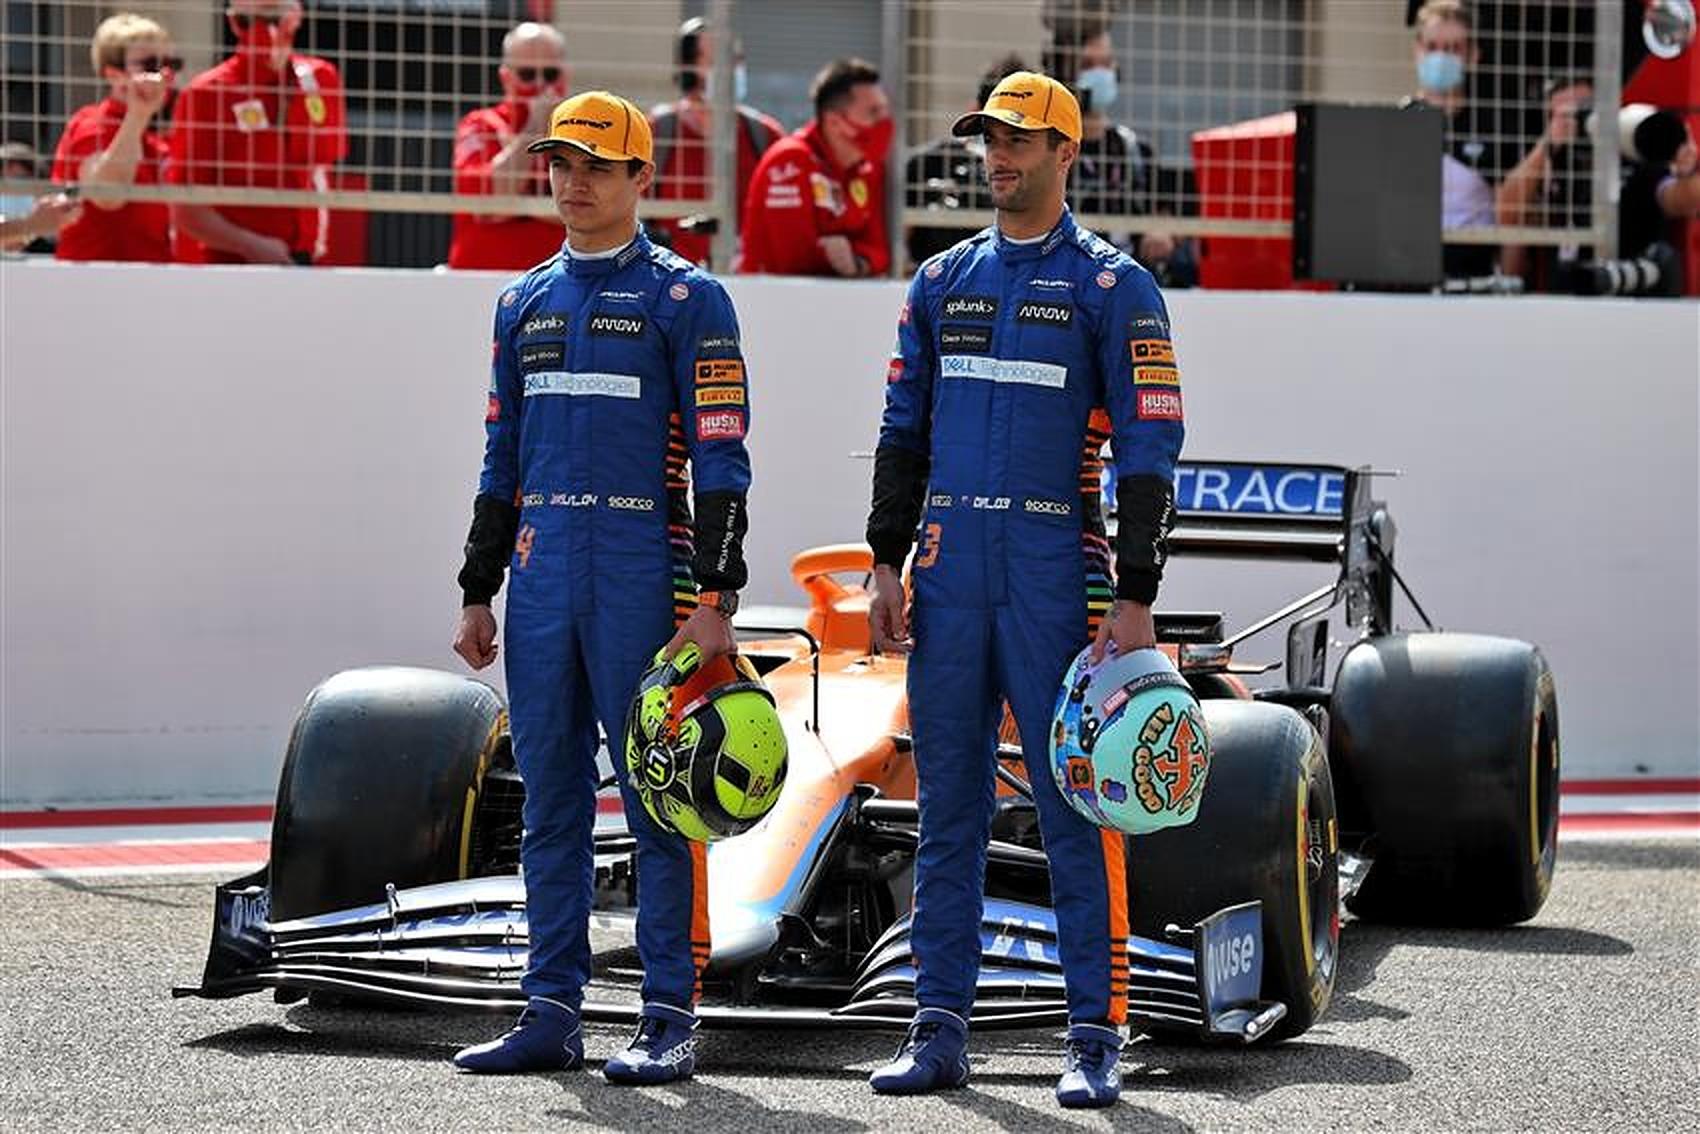 Daniel Ricciardo and Lando Norris at McLaren - Formula1news.co.uk